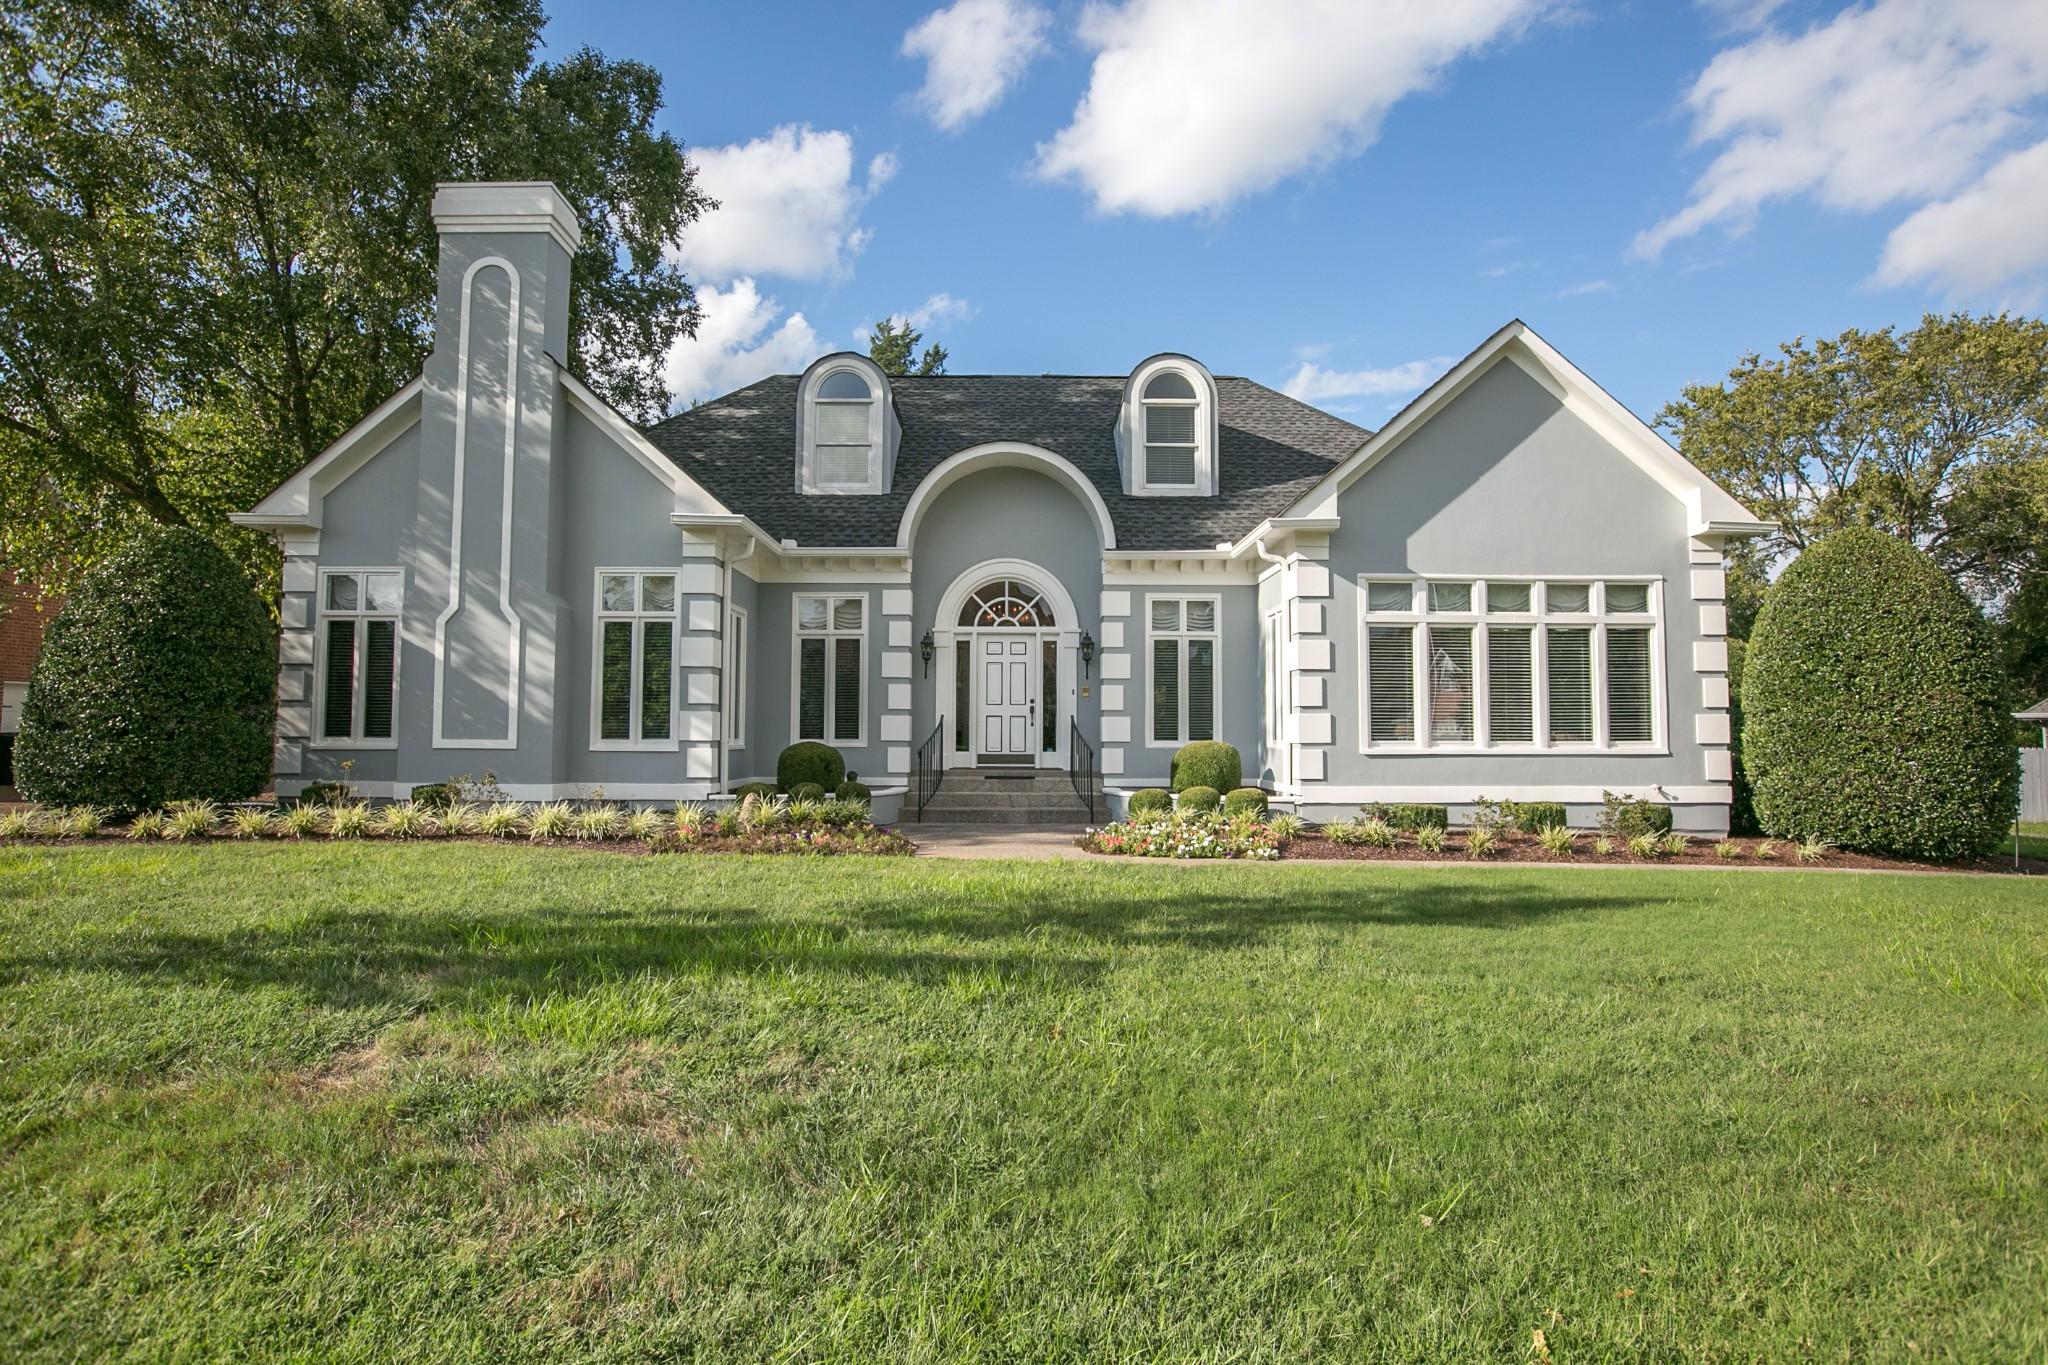 3118 Saint Johns Dr Property Photo - Murfreesboro, TN real estate listing